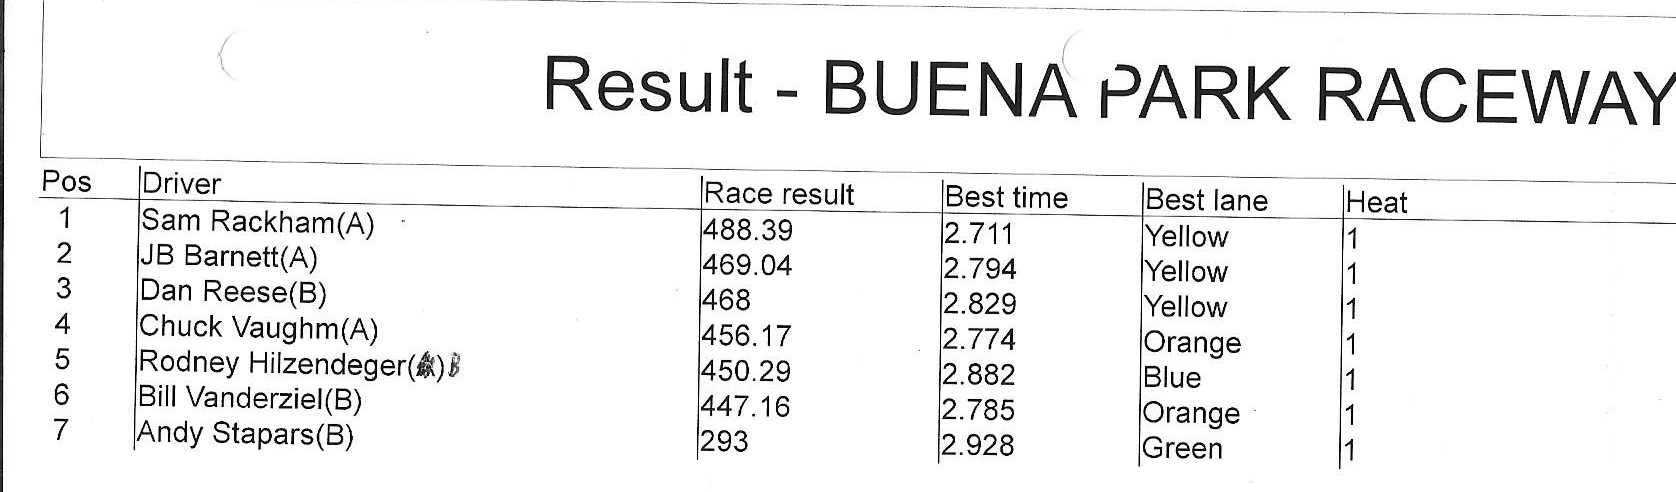 4619 phx ltd results.jpeg